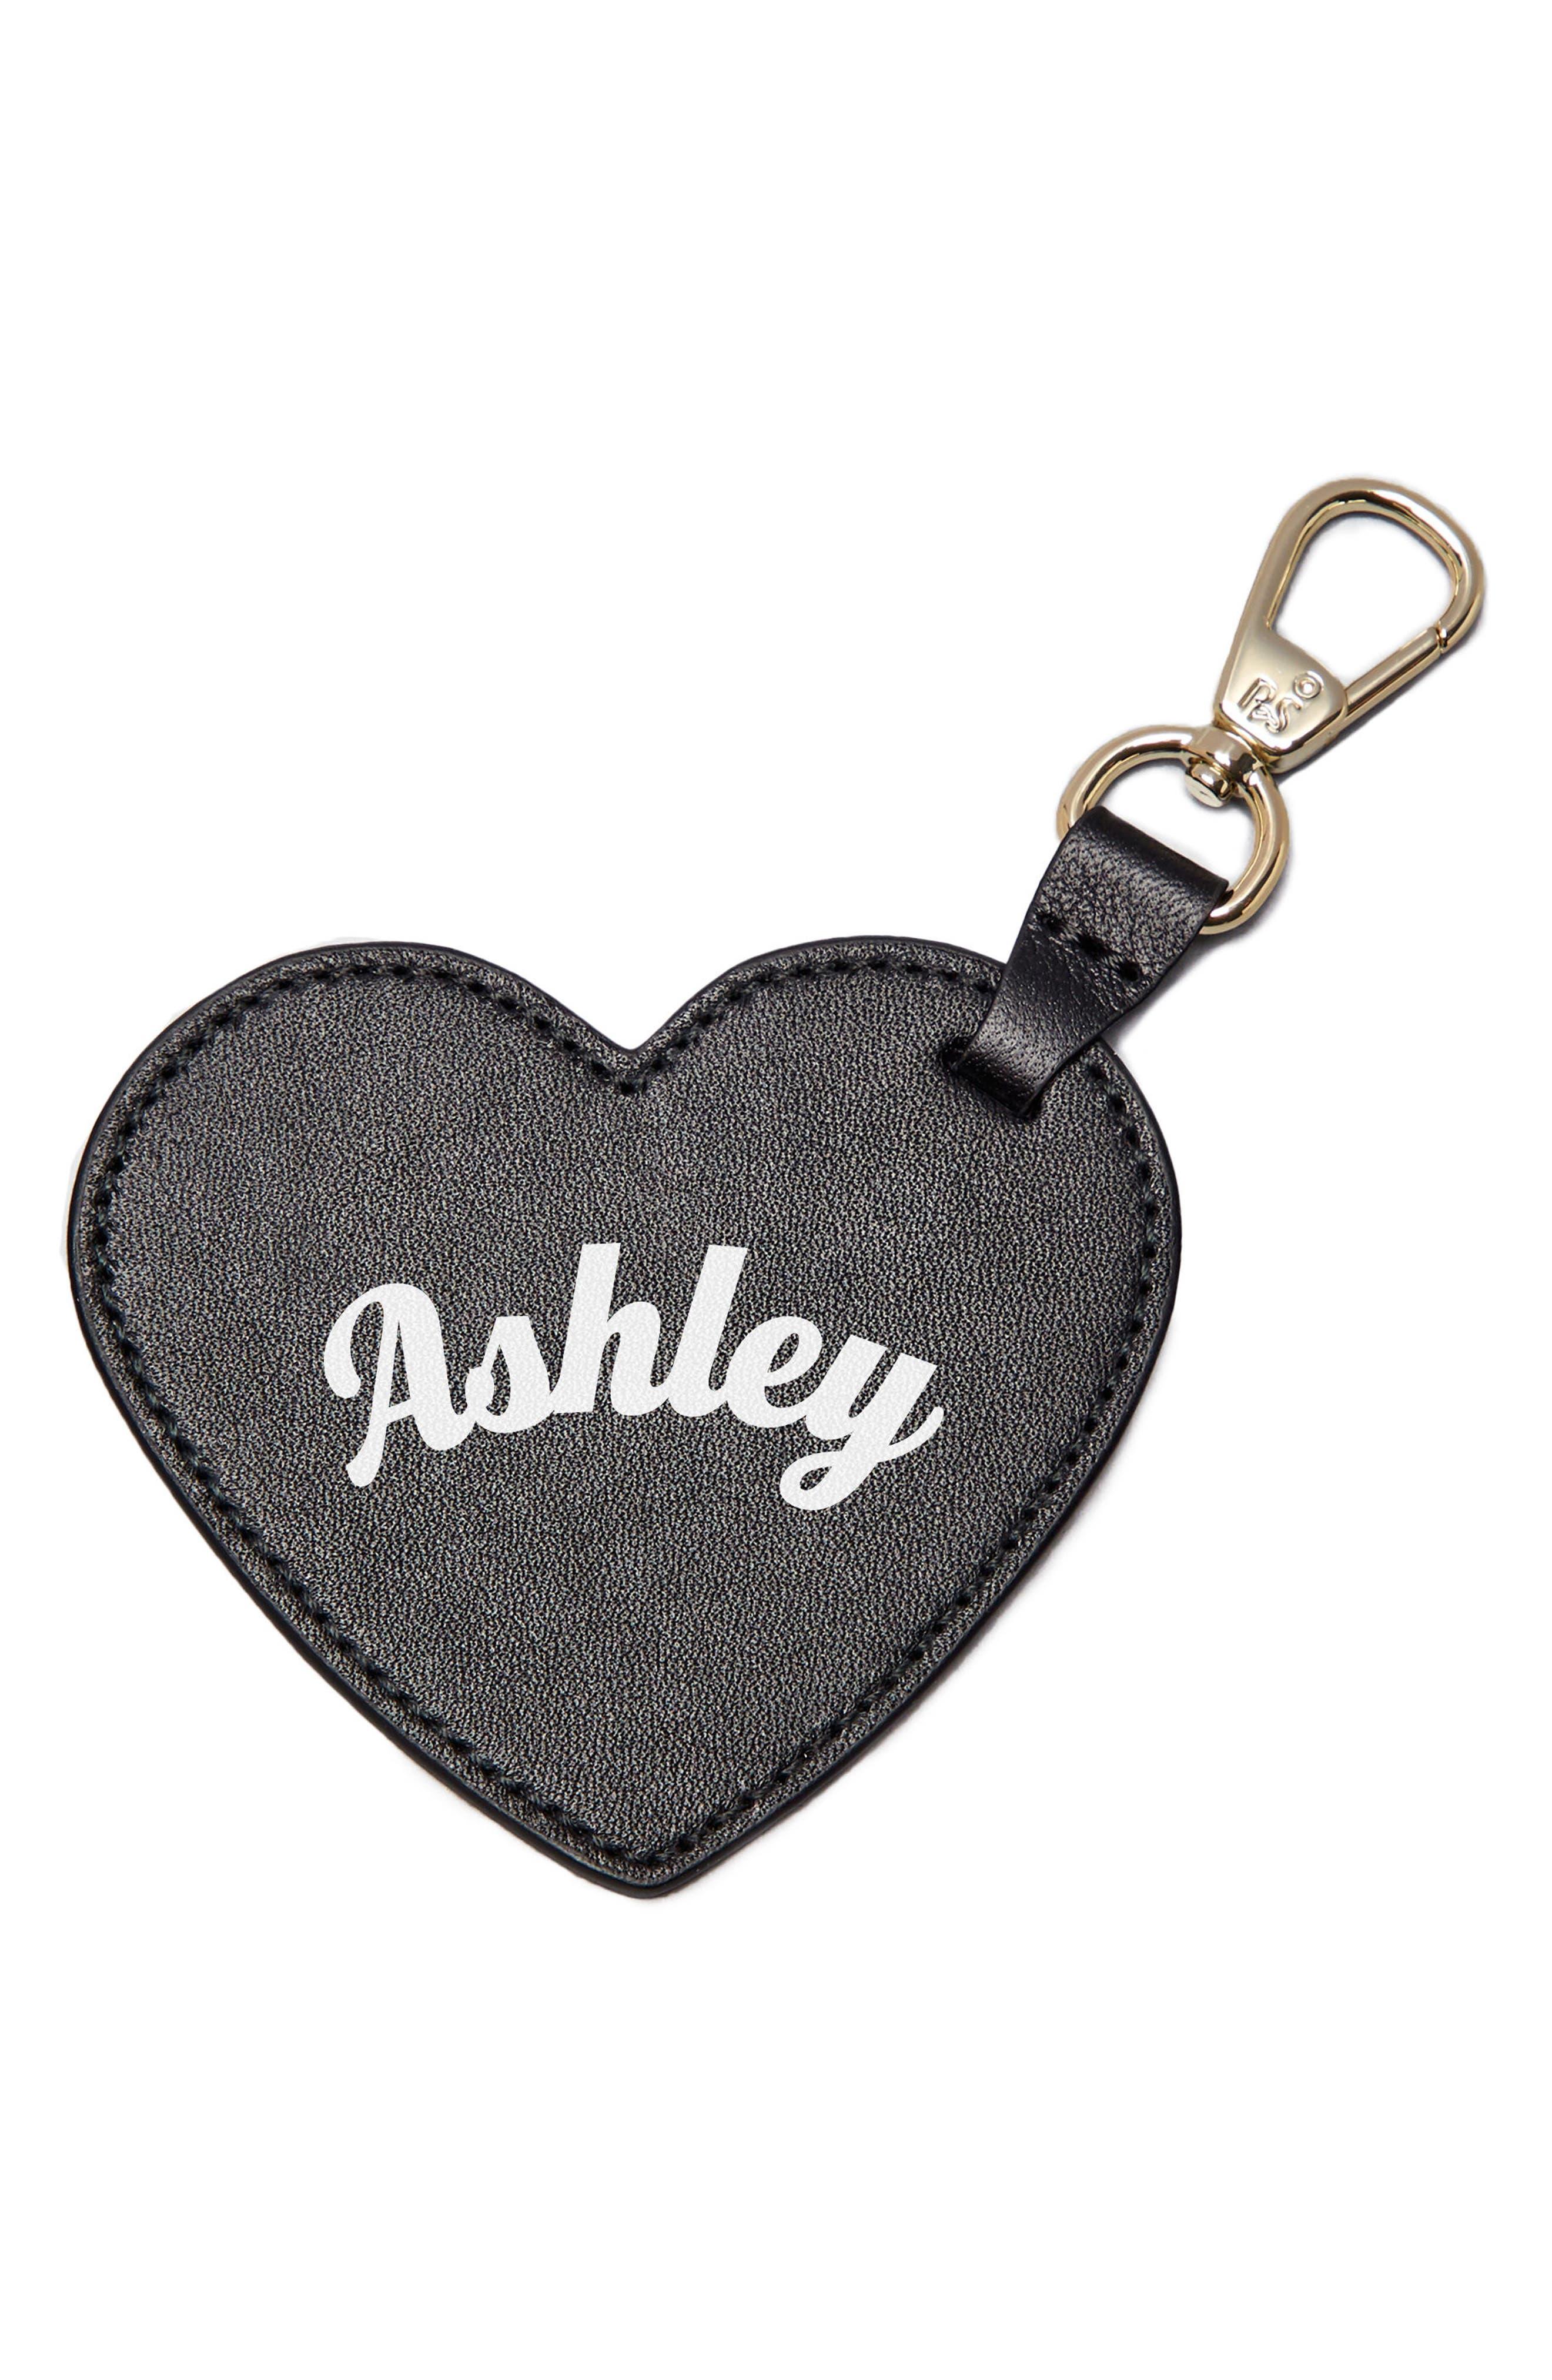 Smaller Heart Personalized Bag Charm,                         Main,                         color, Noir/ White